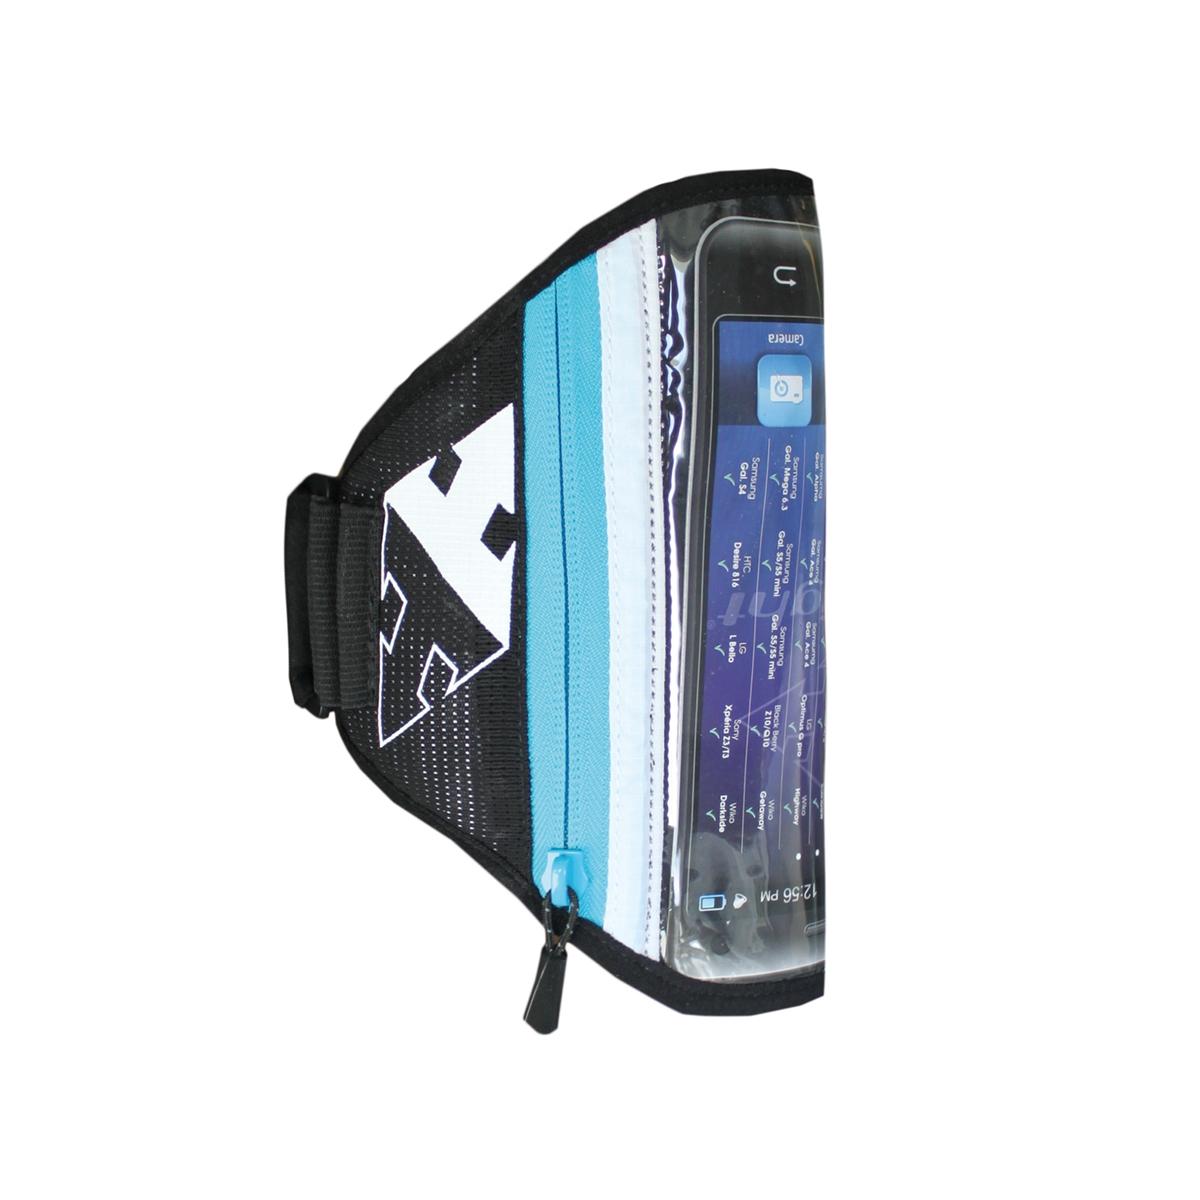 RaidLight pouzdro na telefon Smartphone Arm Belt XL Barva: dark grey / electric blue